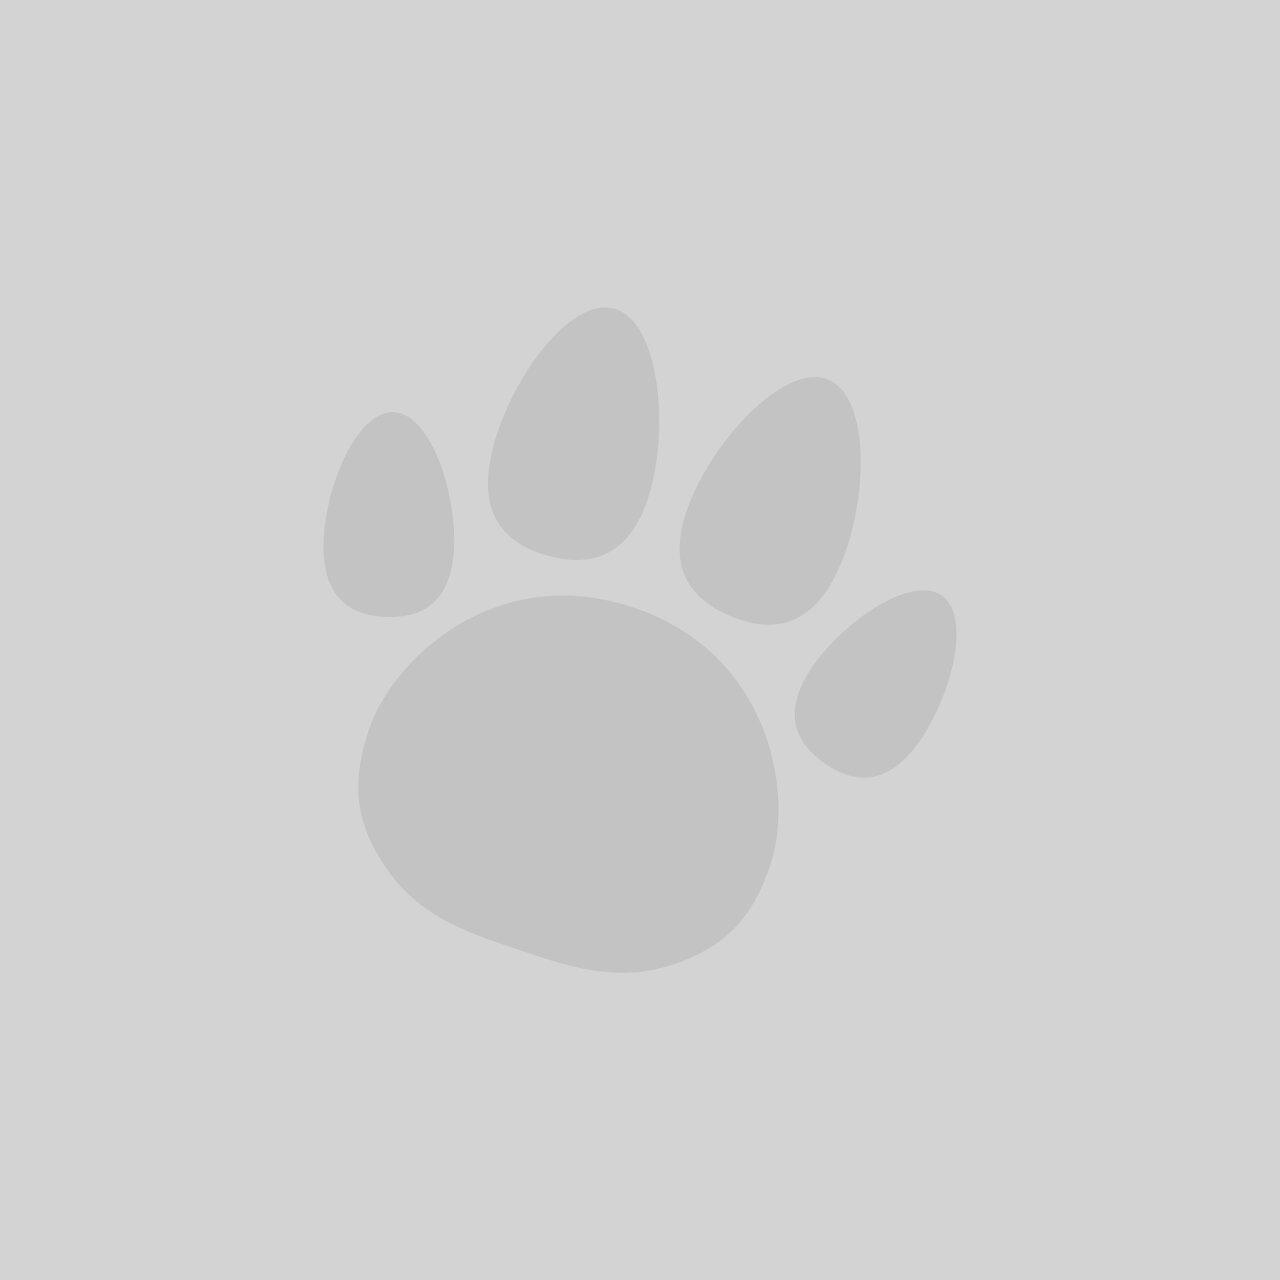 Iams Minis Dog Treats Chicken & Carrot 100g